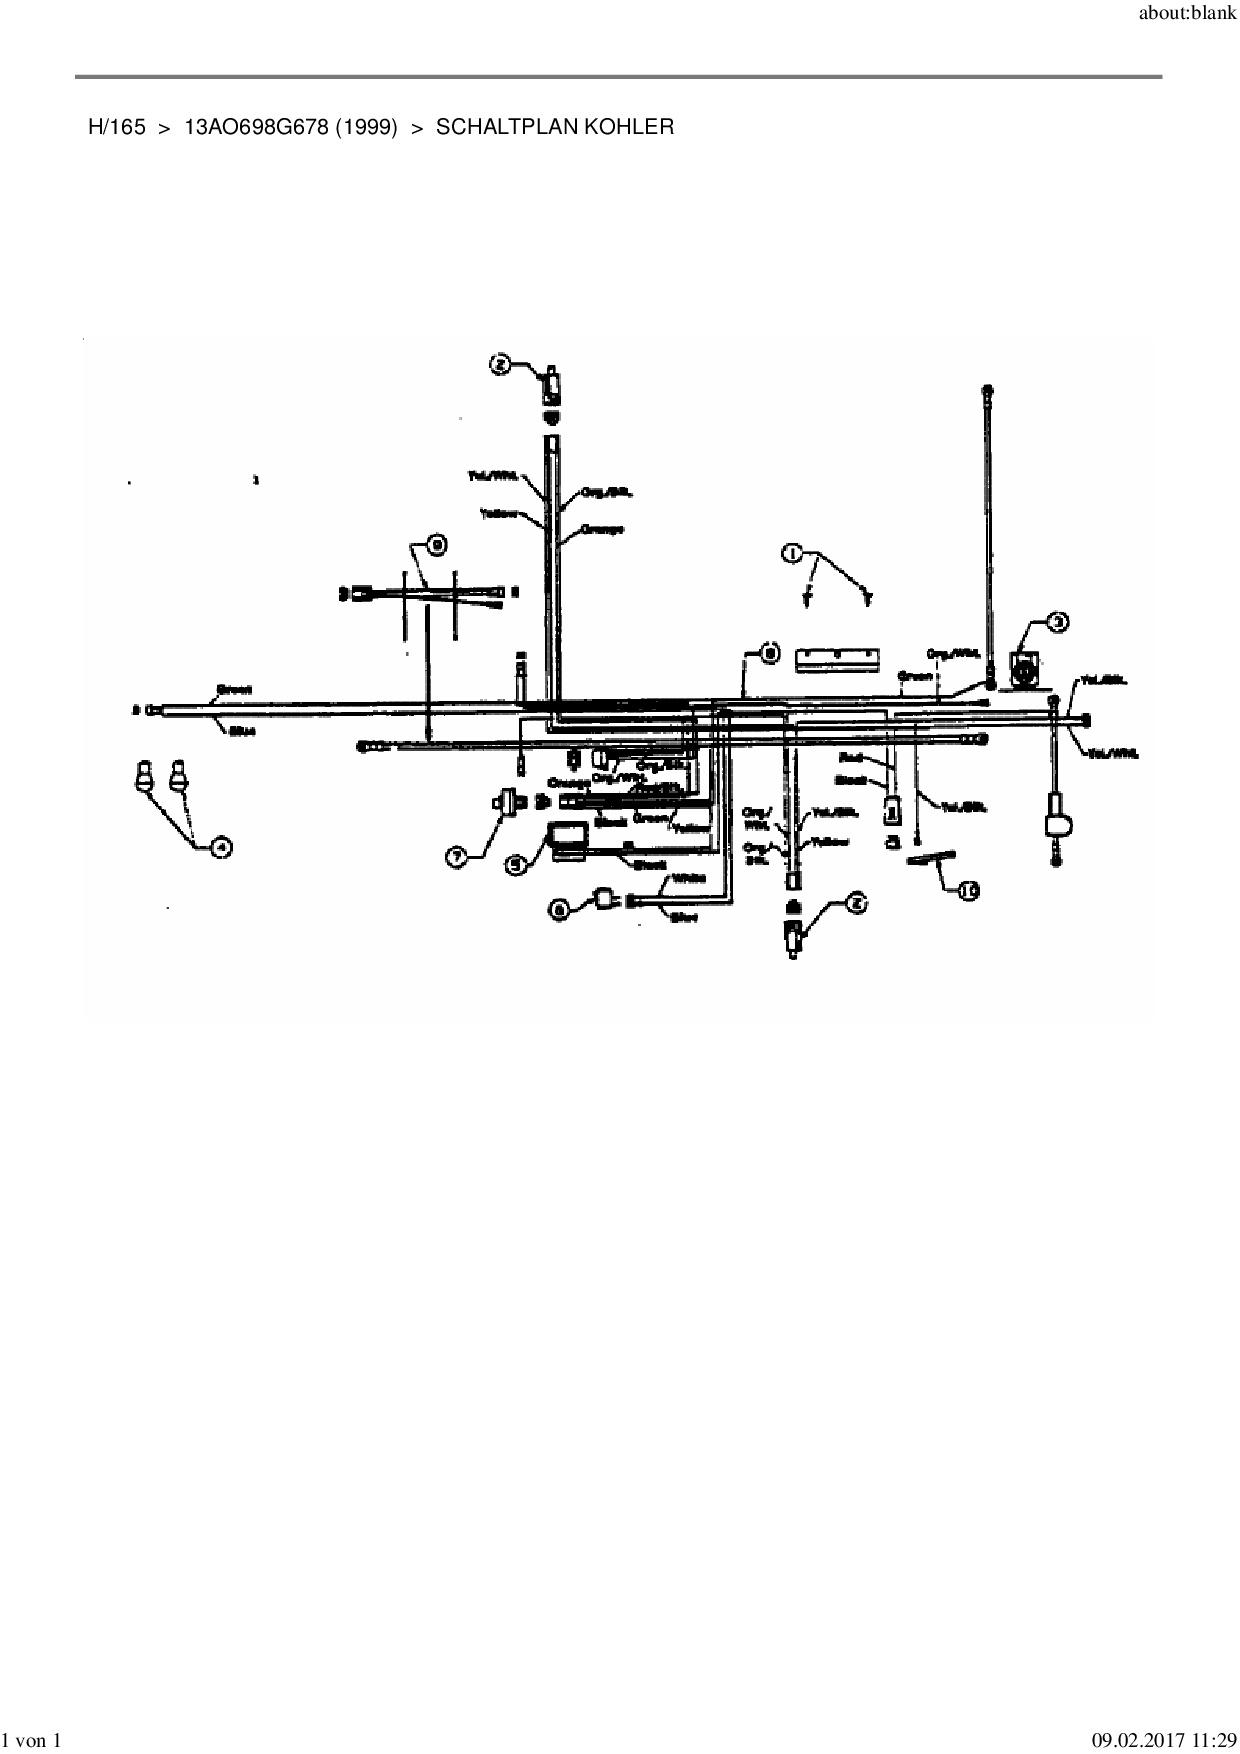 Atemberaubend Handwerker Traktor Schaltplan Galerie - Schaltplan ...